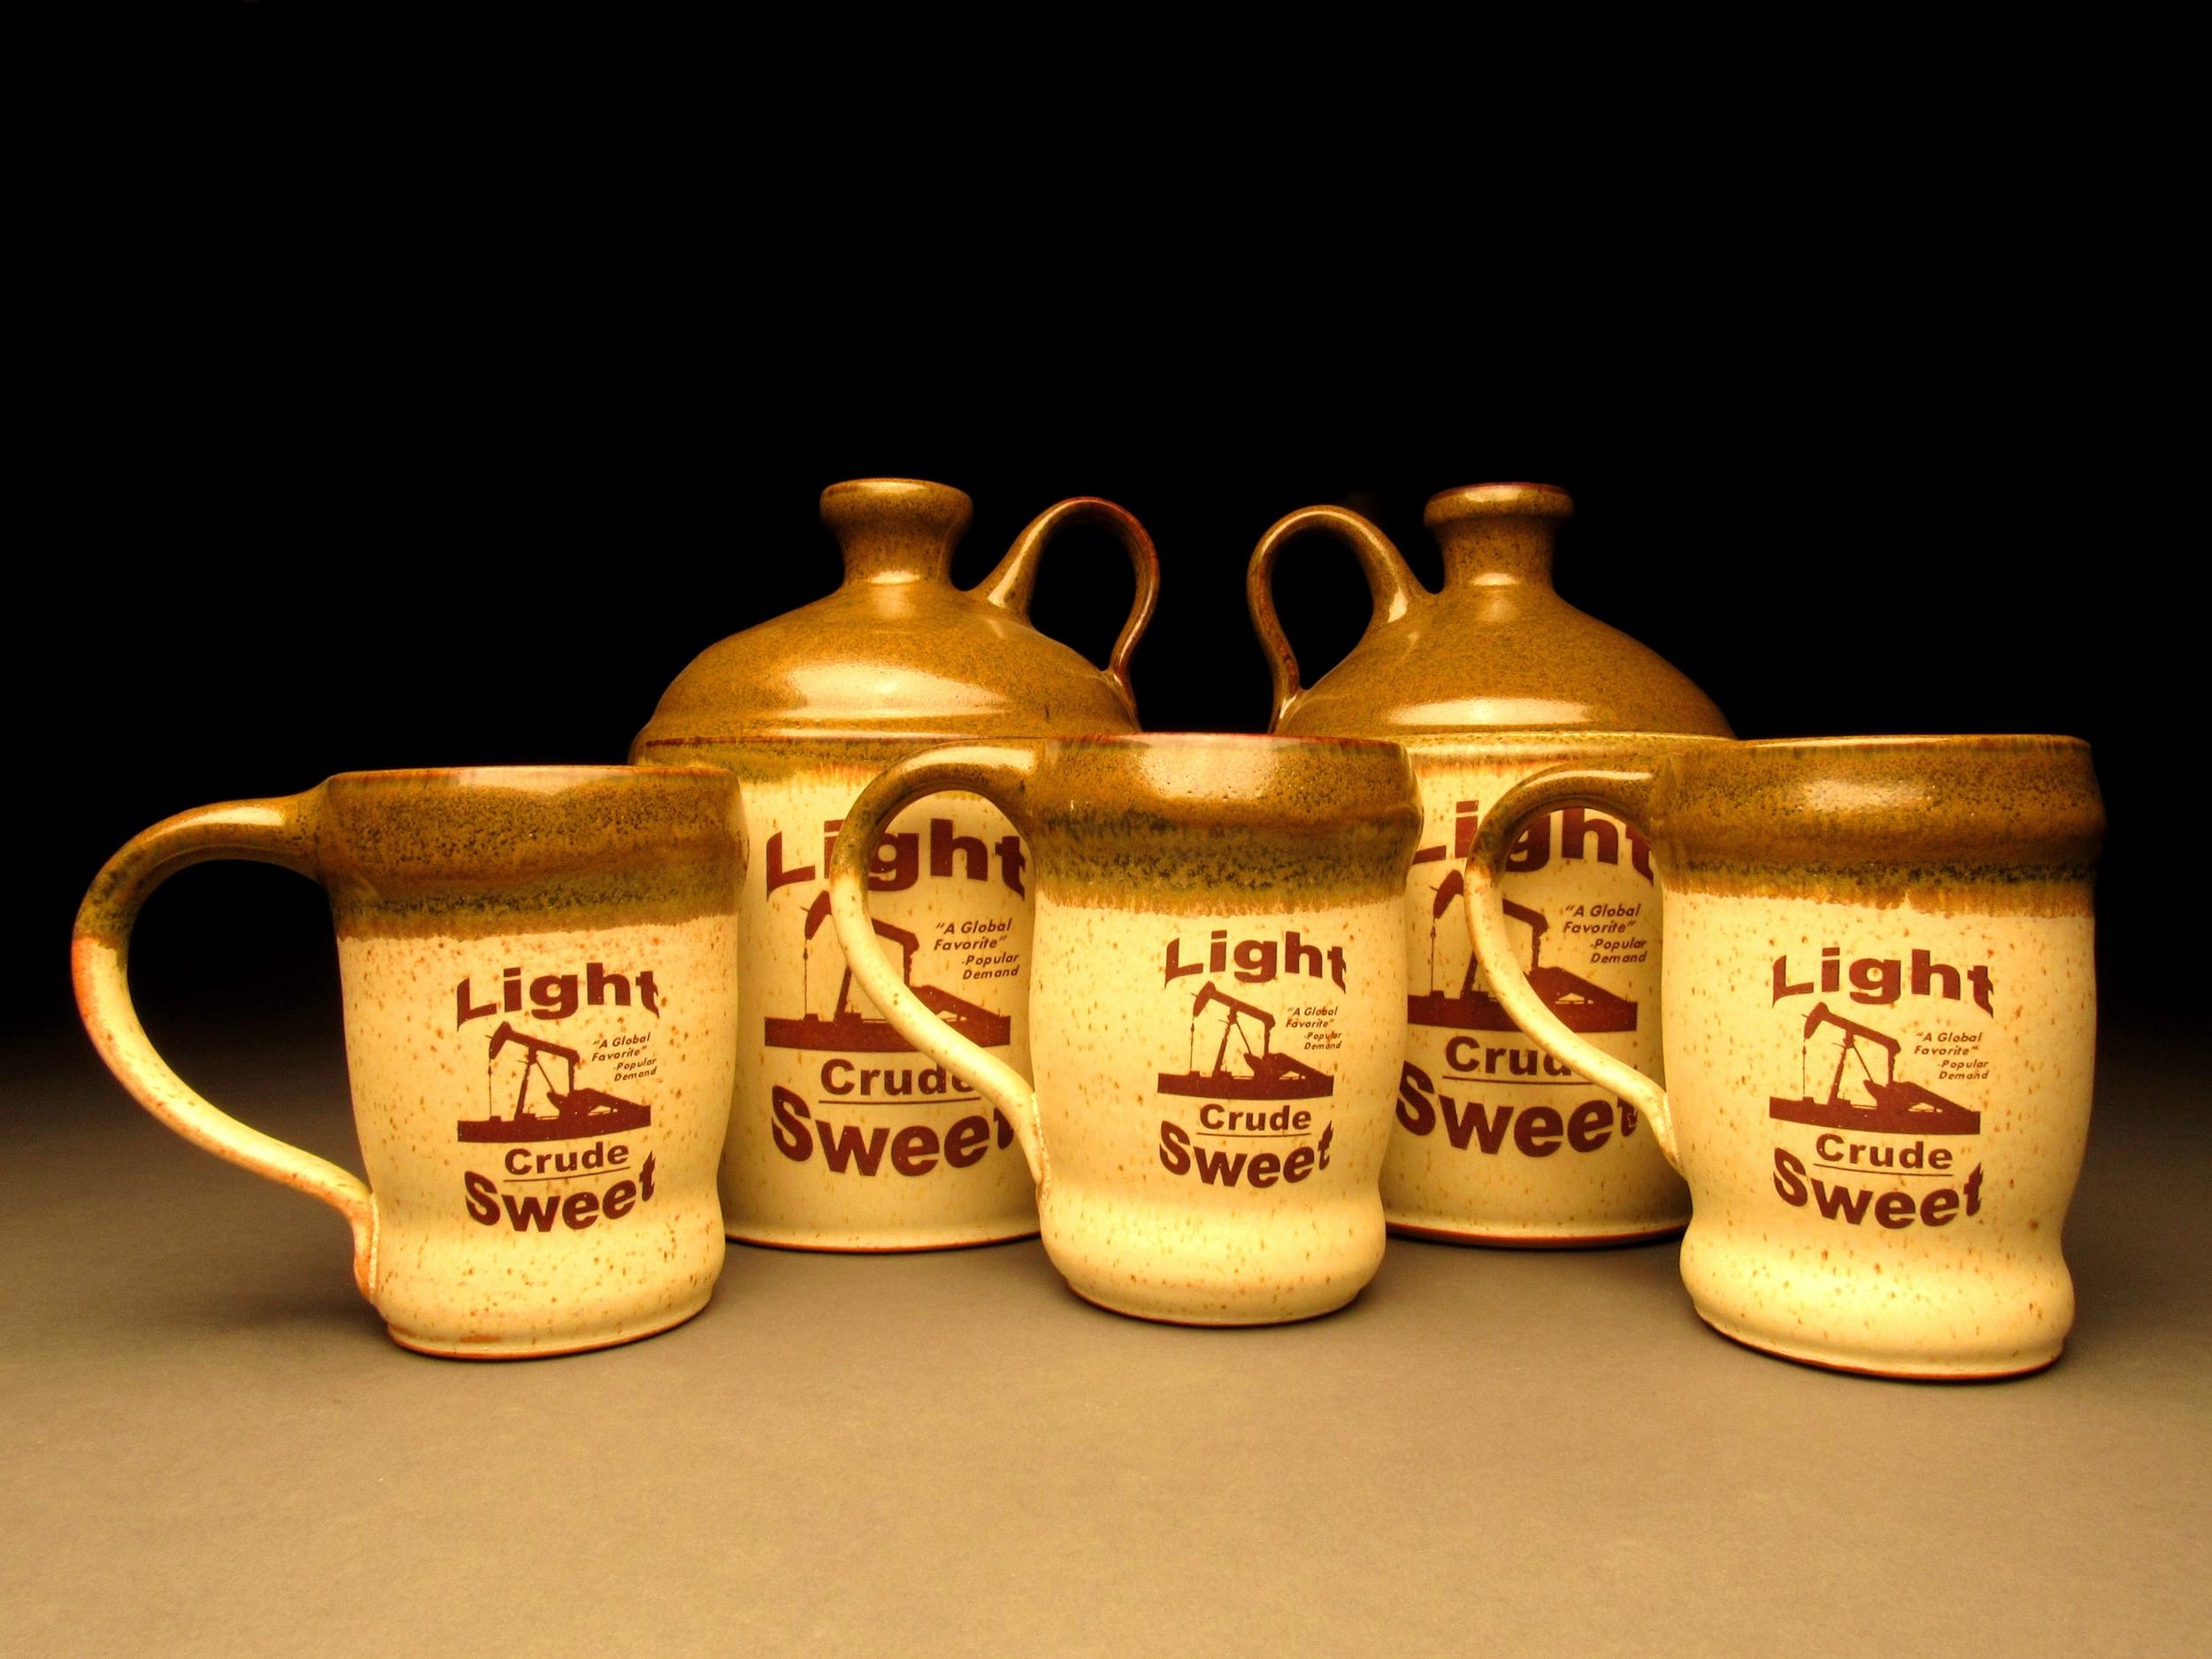 Light Sweet Crude Mugs and Jugs.JPG